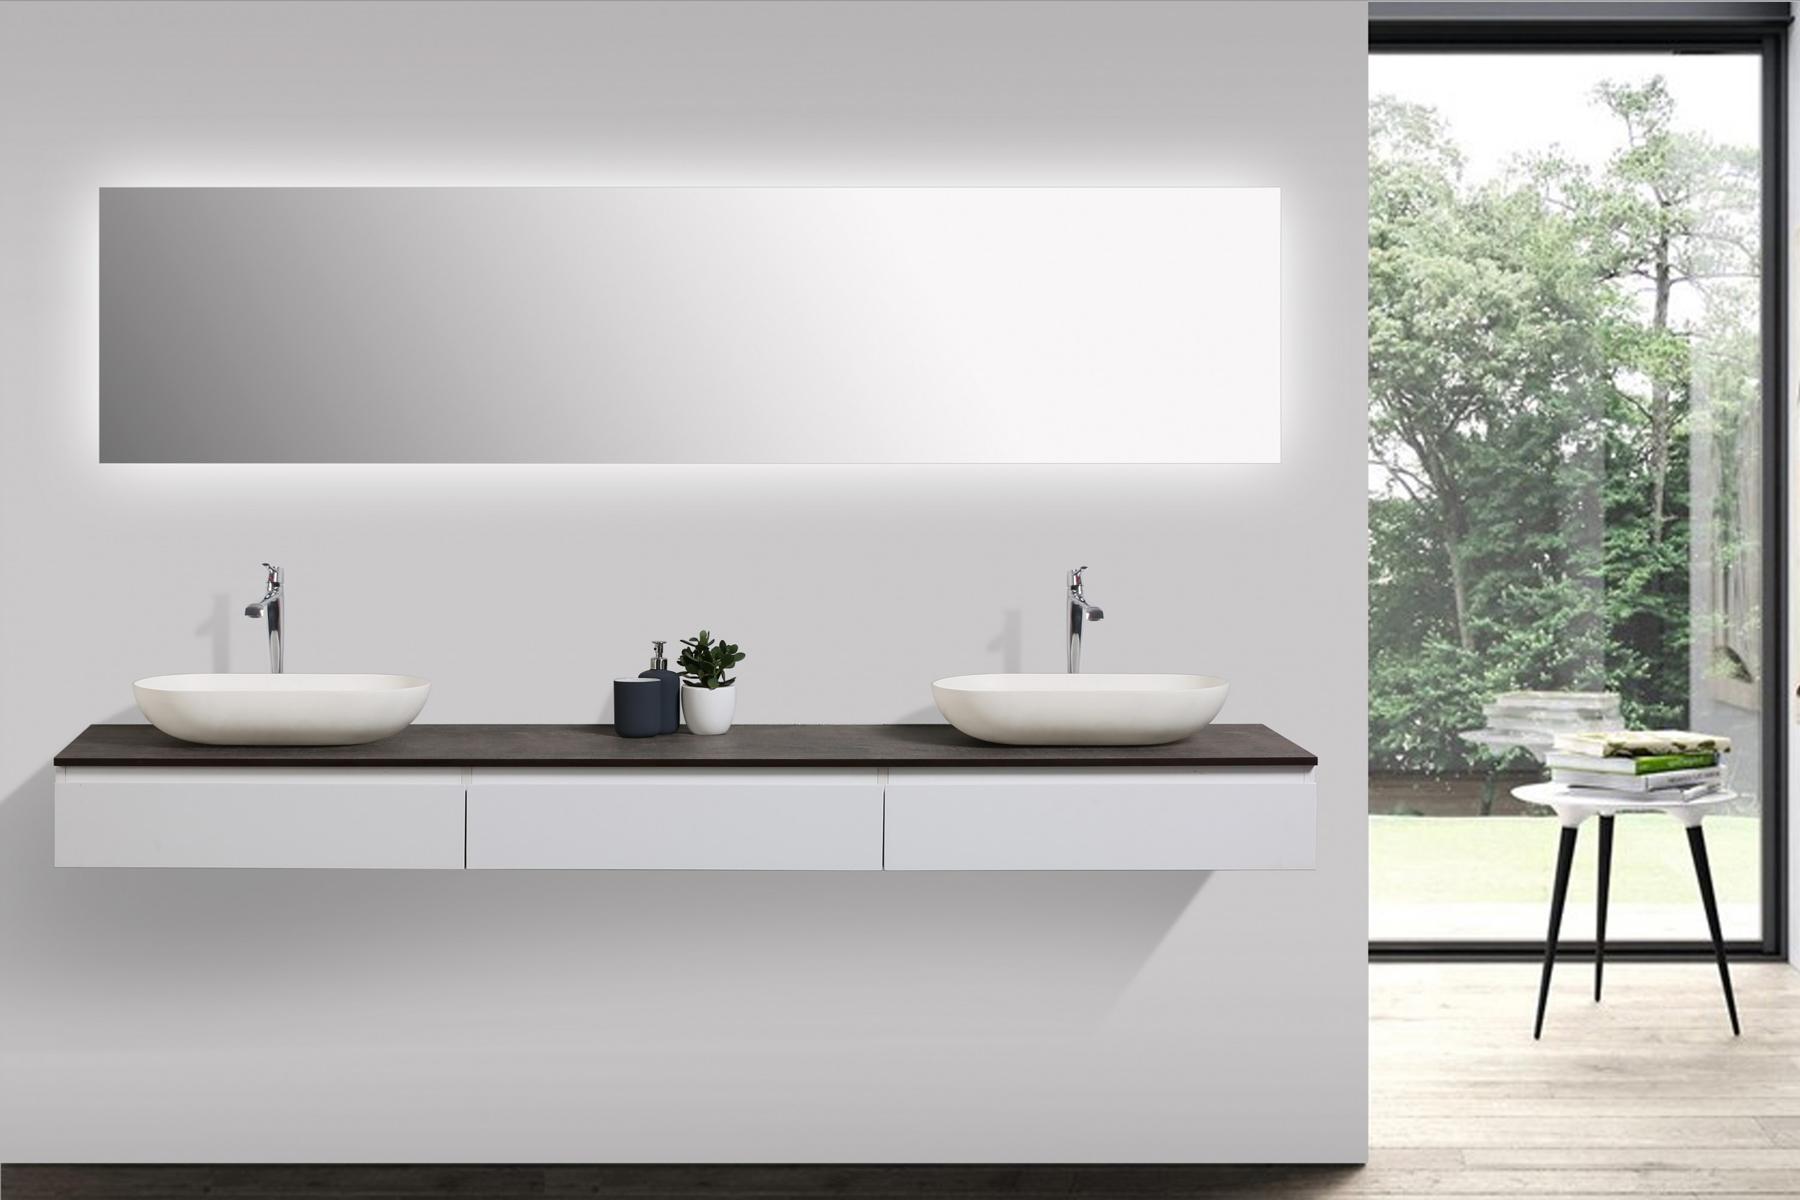 Mobili da bagno vision 2250 bianco opaco bacino opzionale ebay